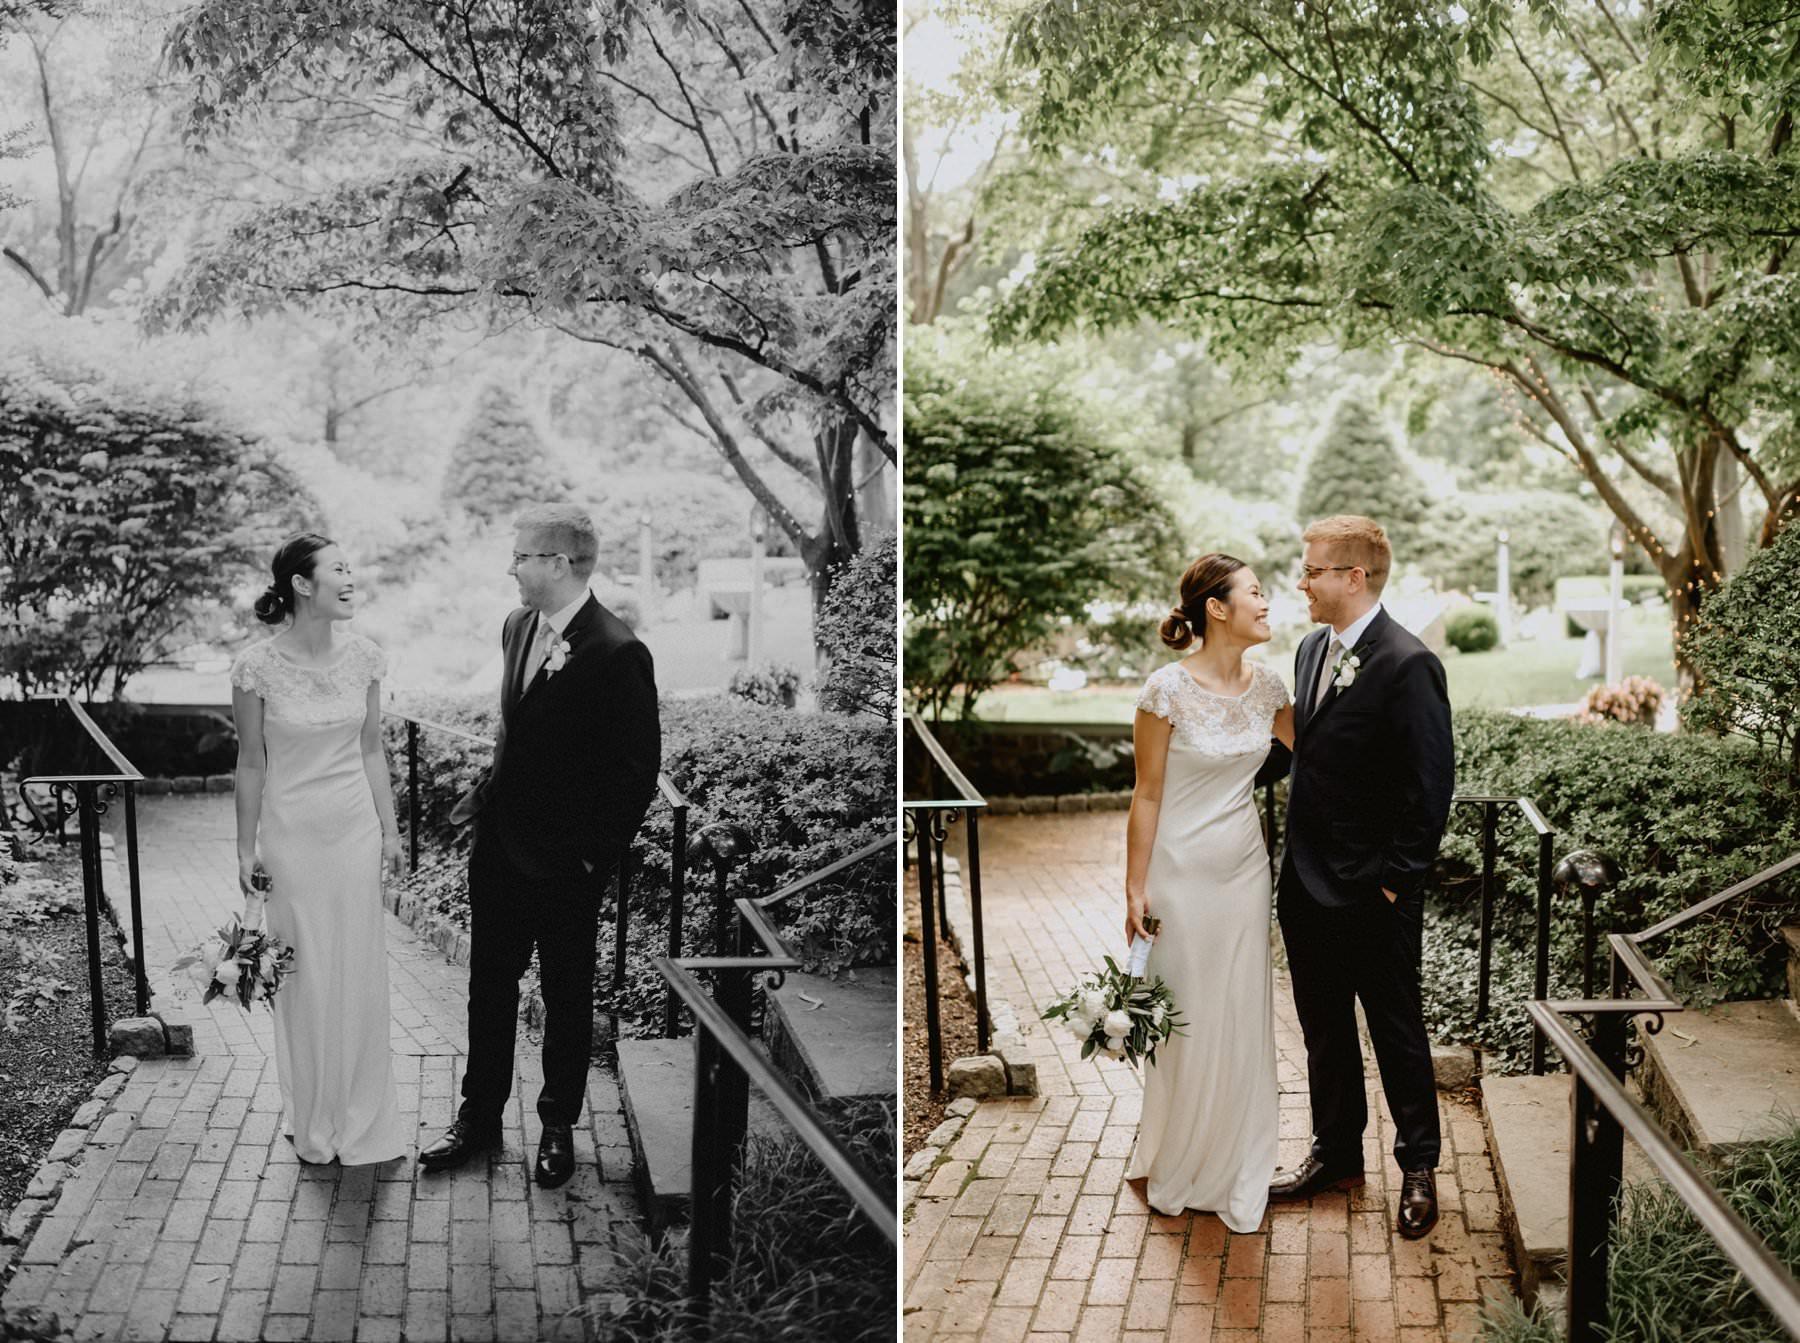 Appleford-estate-wedding-42.jpg